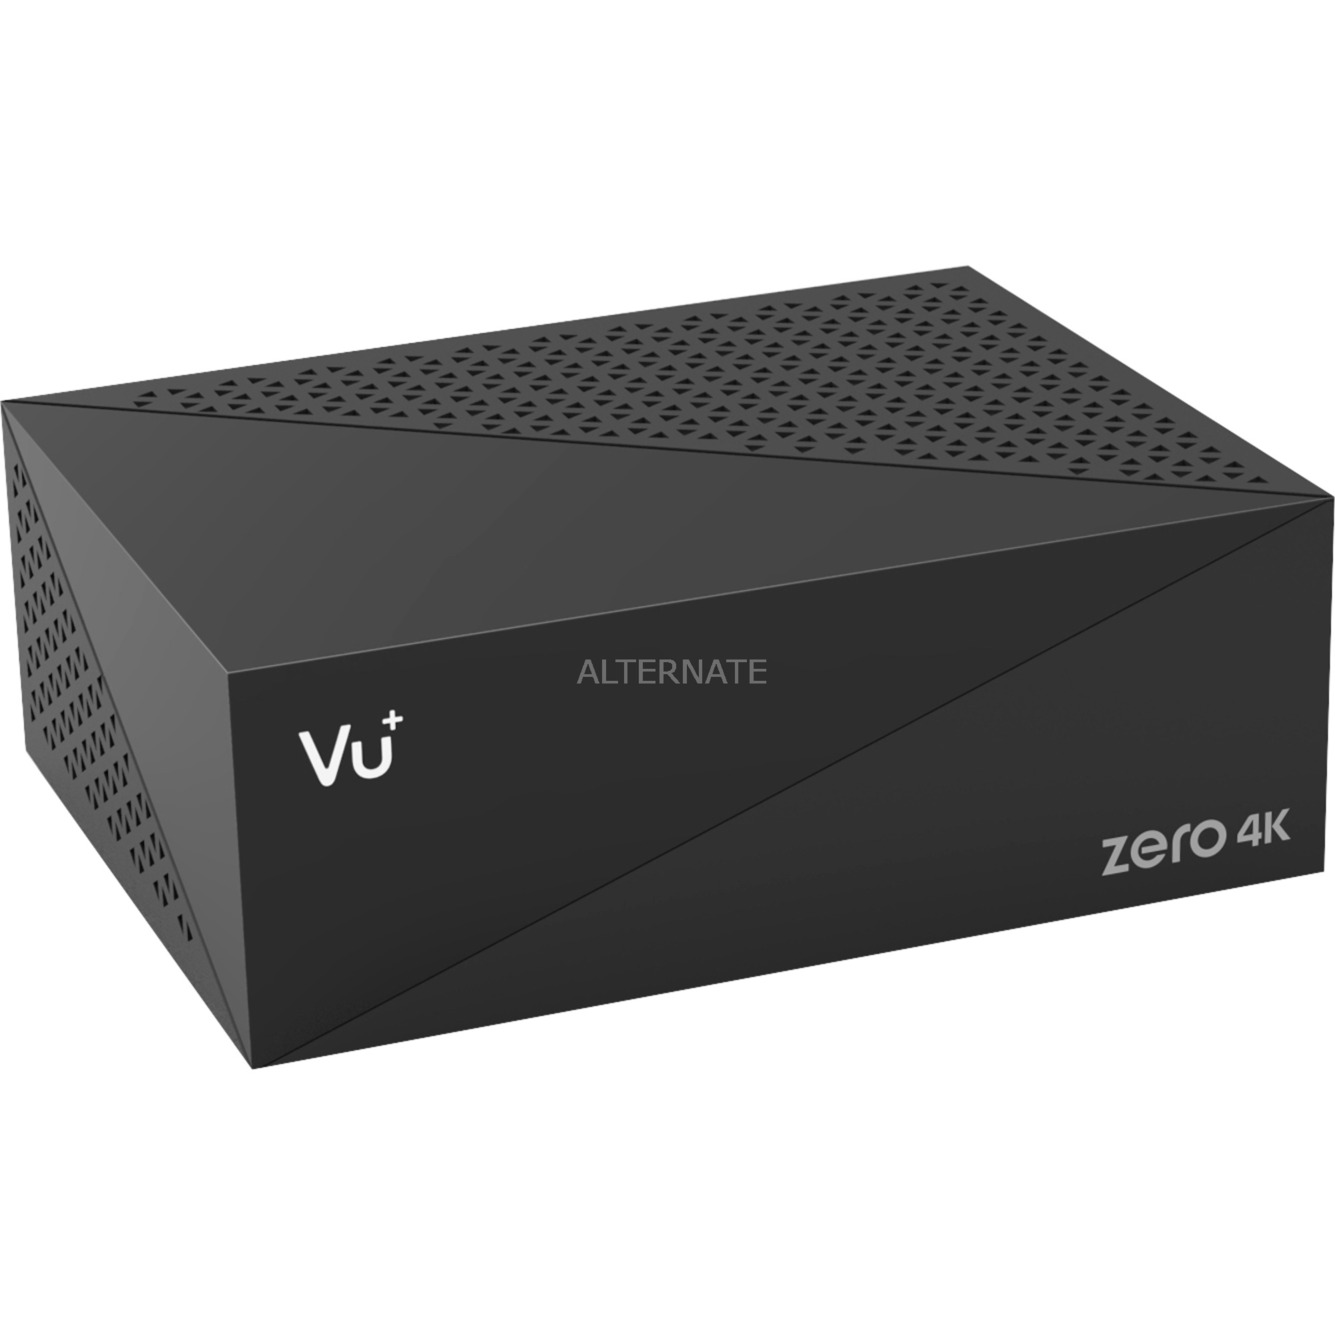 Zero 4K tV set-top boxes Cable, Ethernet (RJ-45), Satélite Alta Definición Total Negro, Receptor terrestre / cable